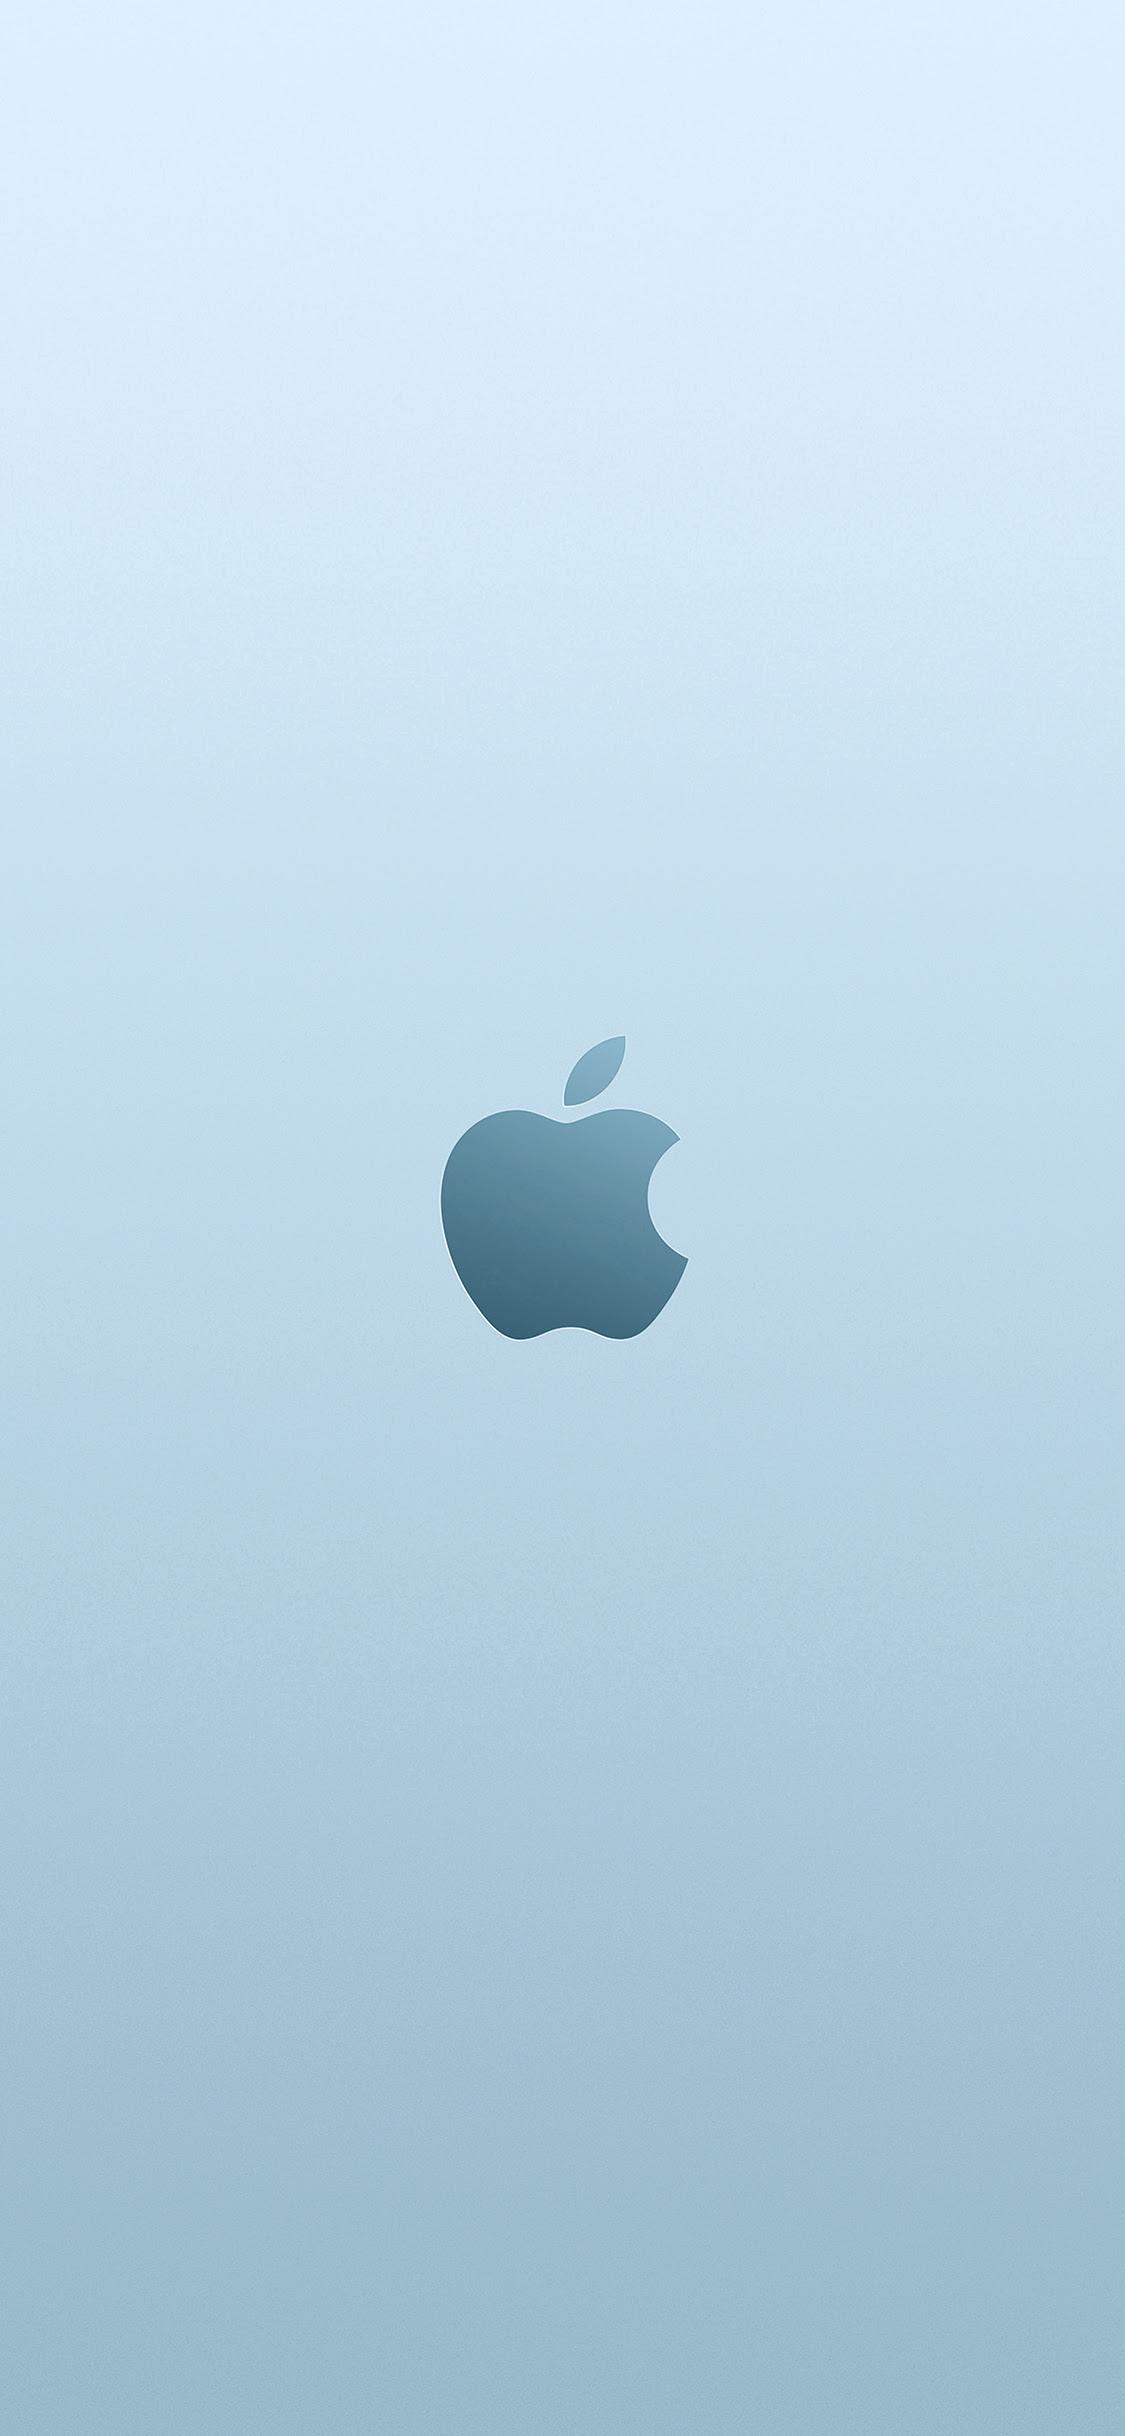 Iphonexpapers Com Iphone X Wallpaper Au13 Apple Blue Minimal